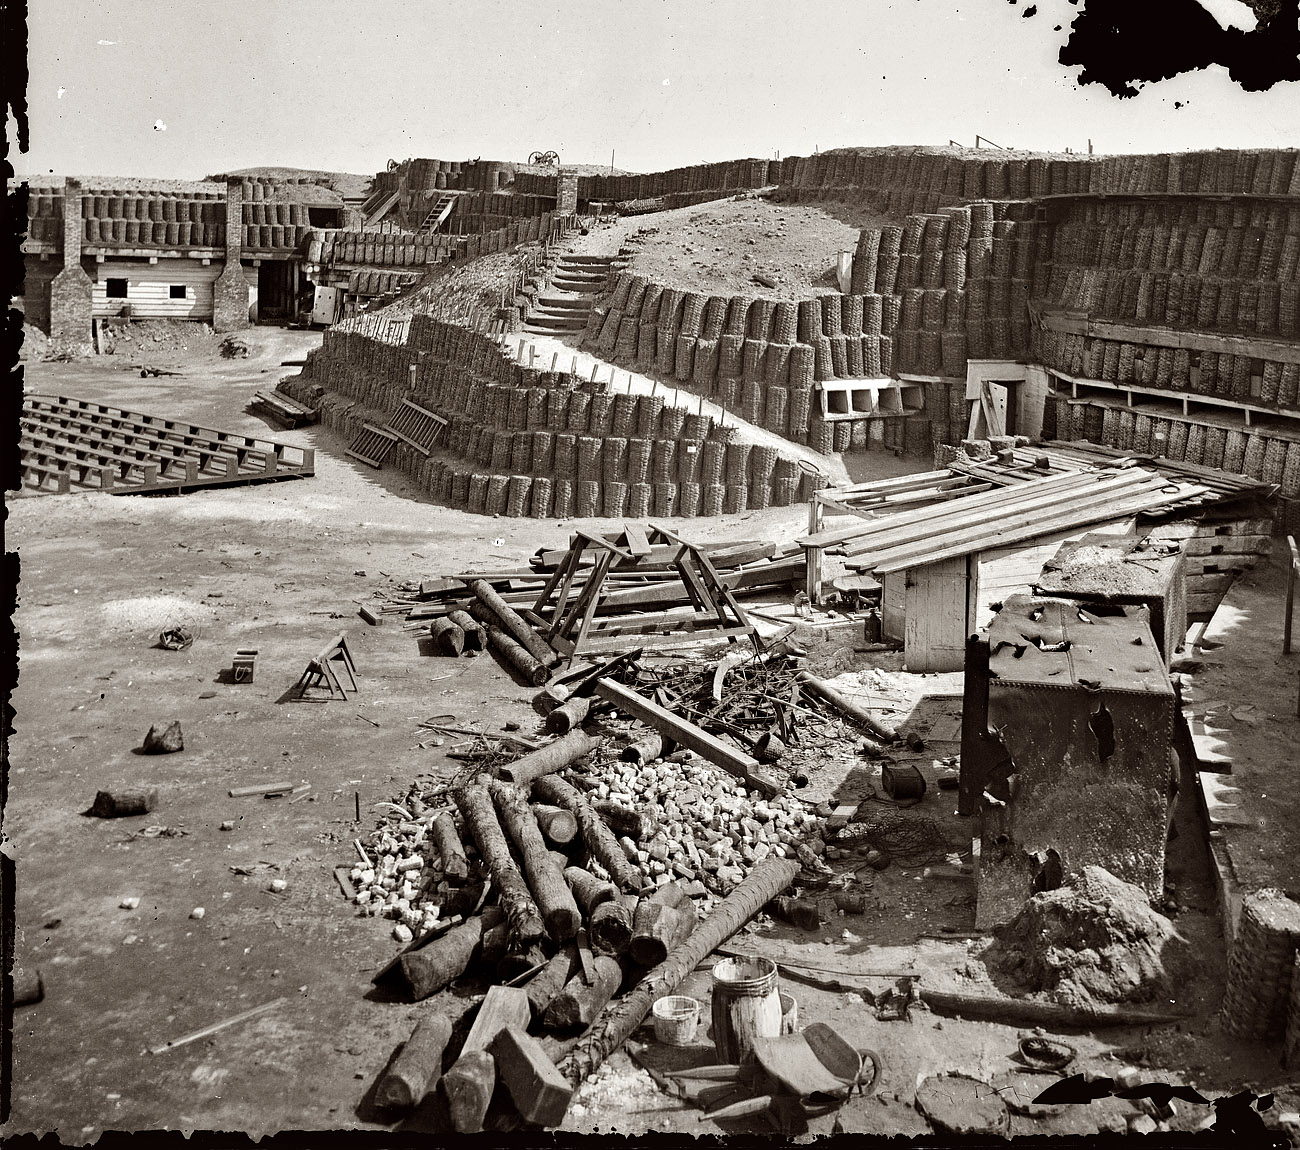 Fort_Sumter_1865